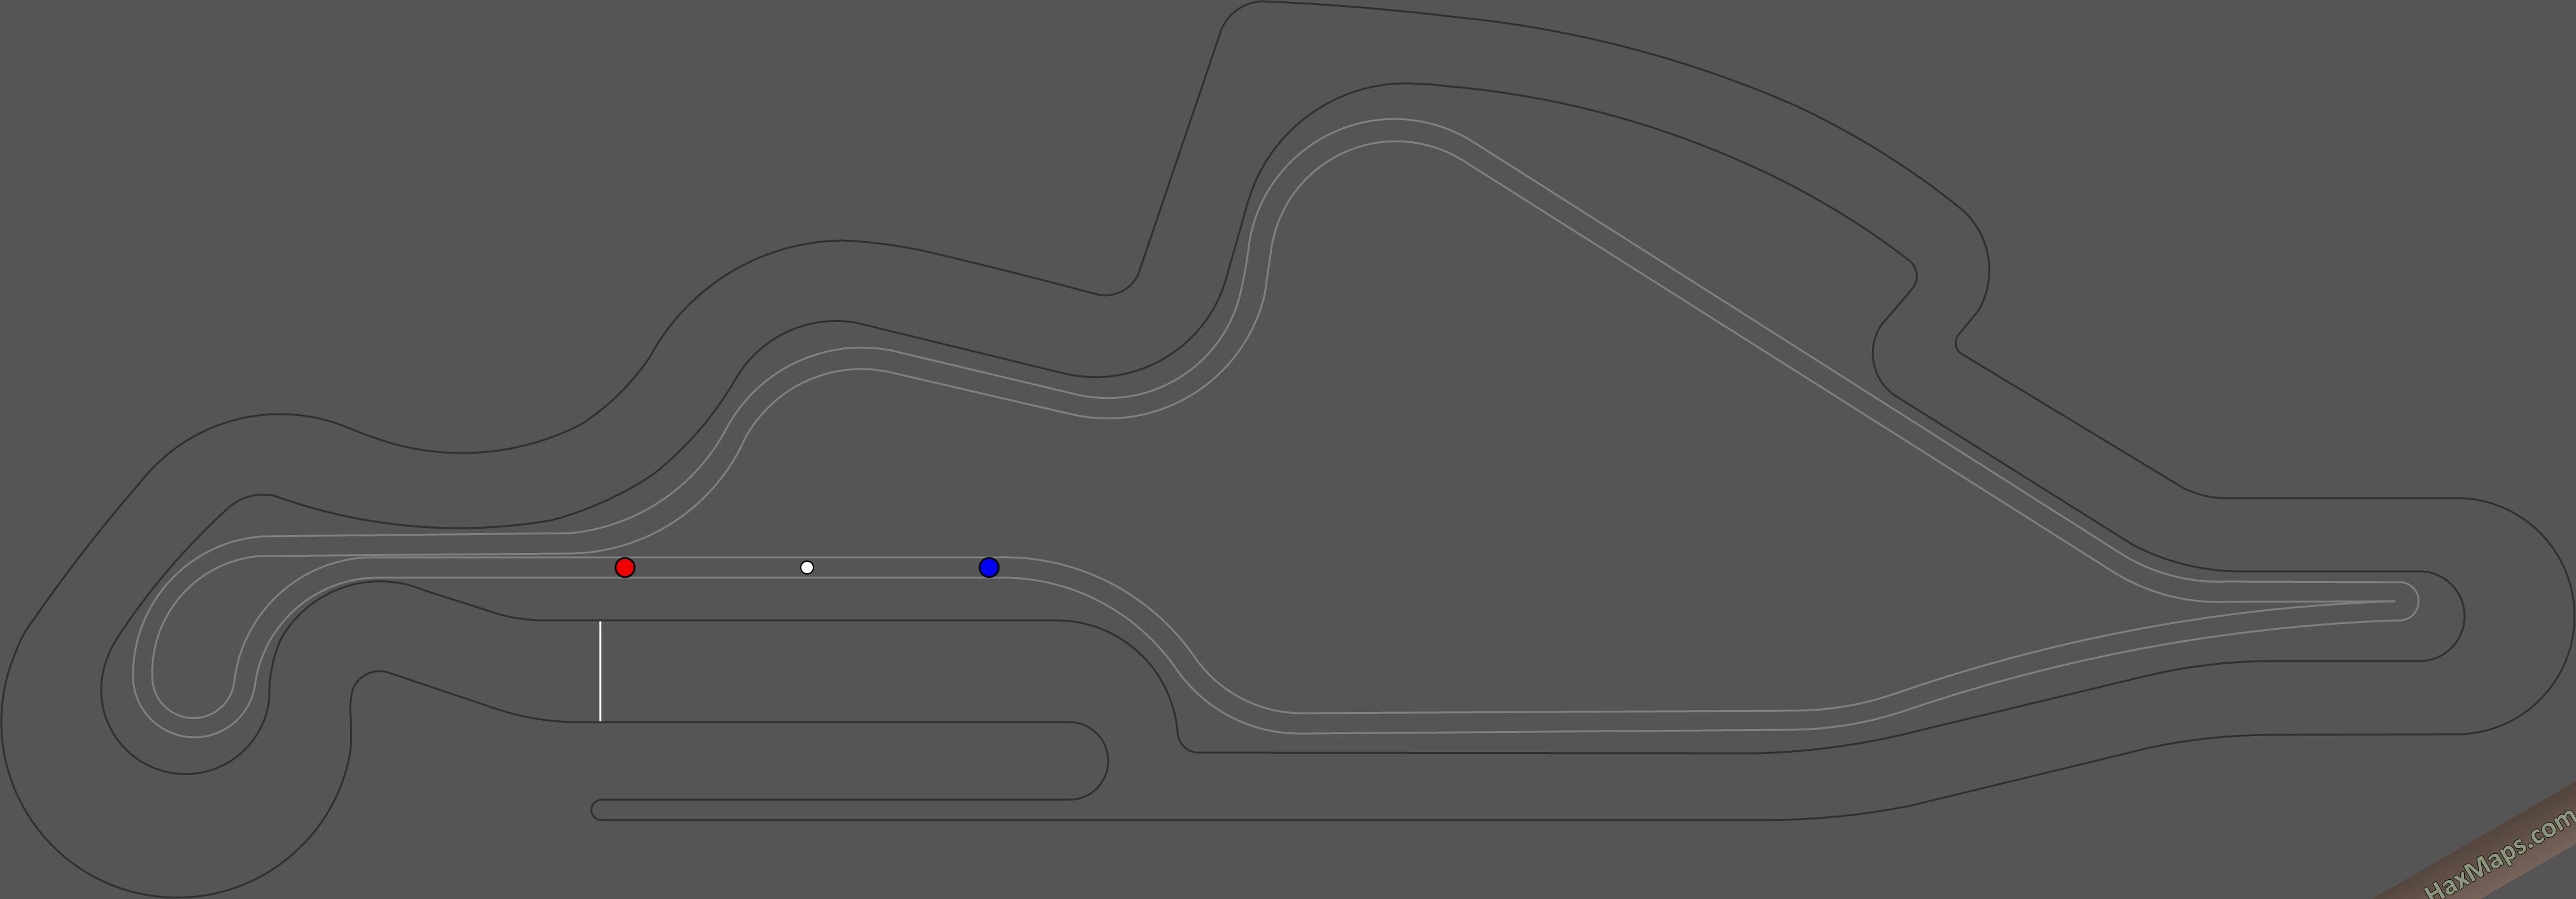 hax ball maps | Q Canada F1 Circuit Gilles Villeneuve